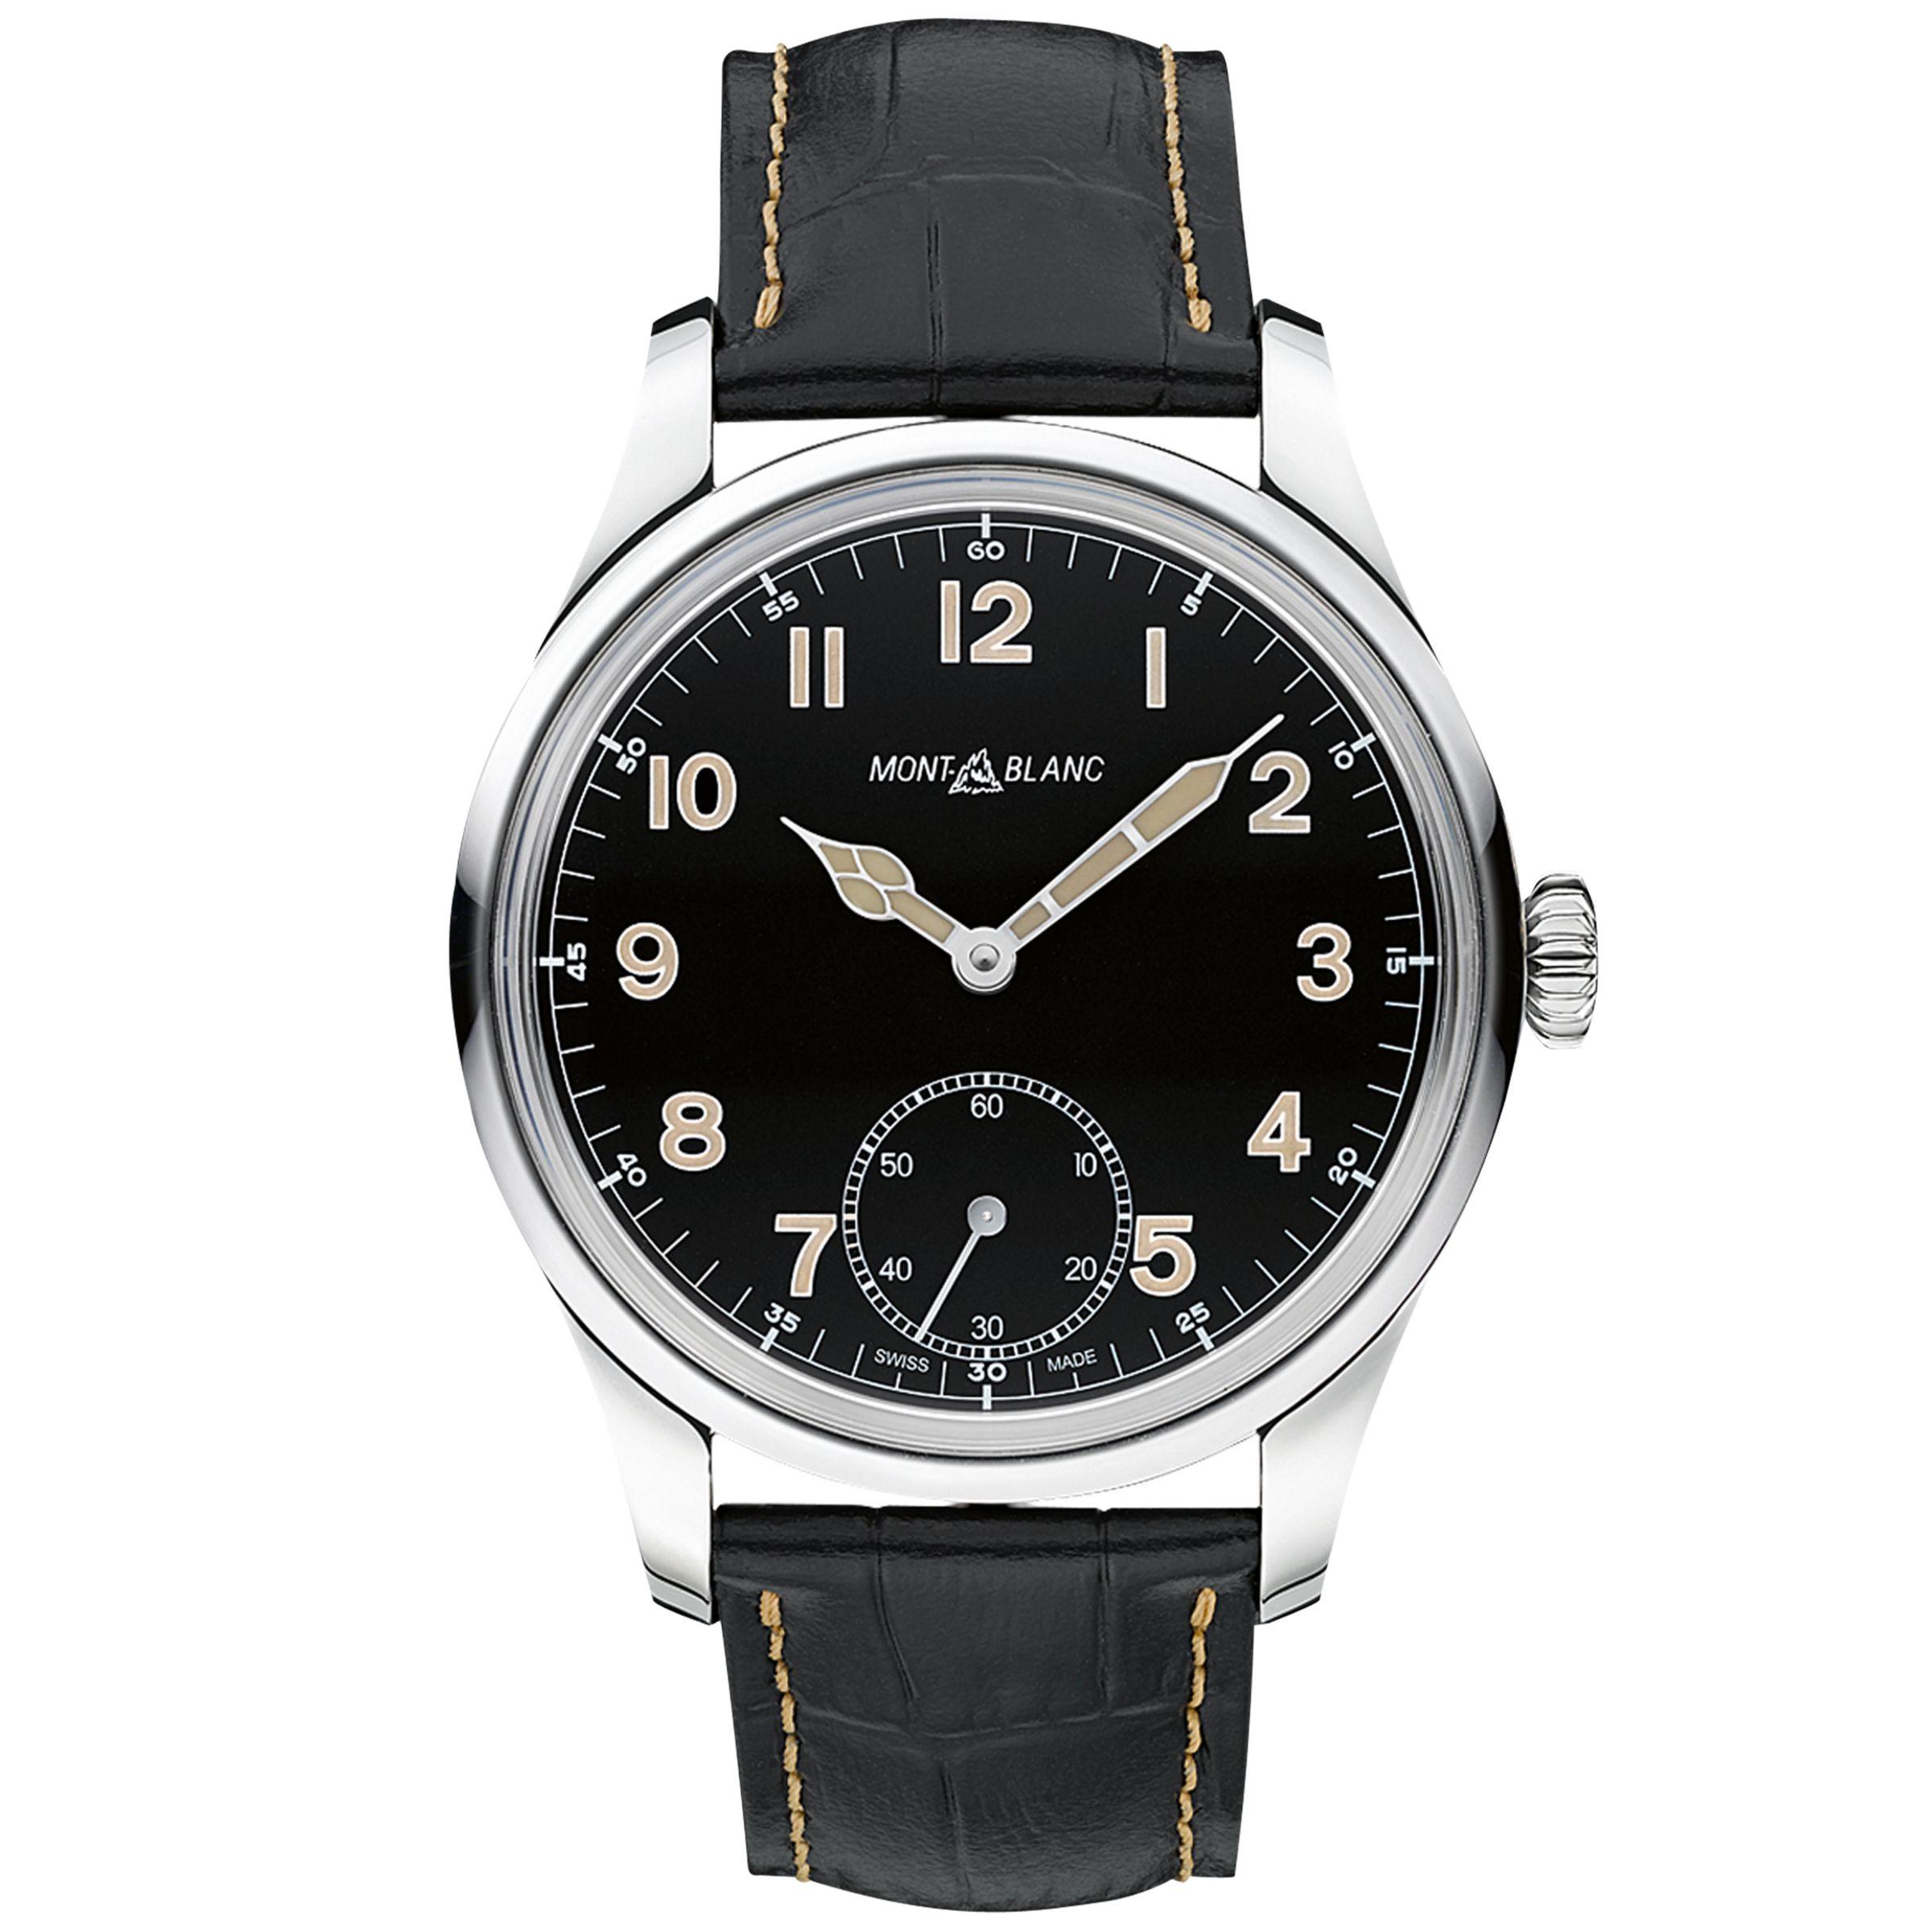 Montblanc Montblanc 113860 Men's 1858 Leather Strap Watch, Black